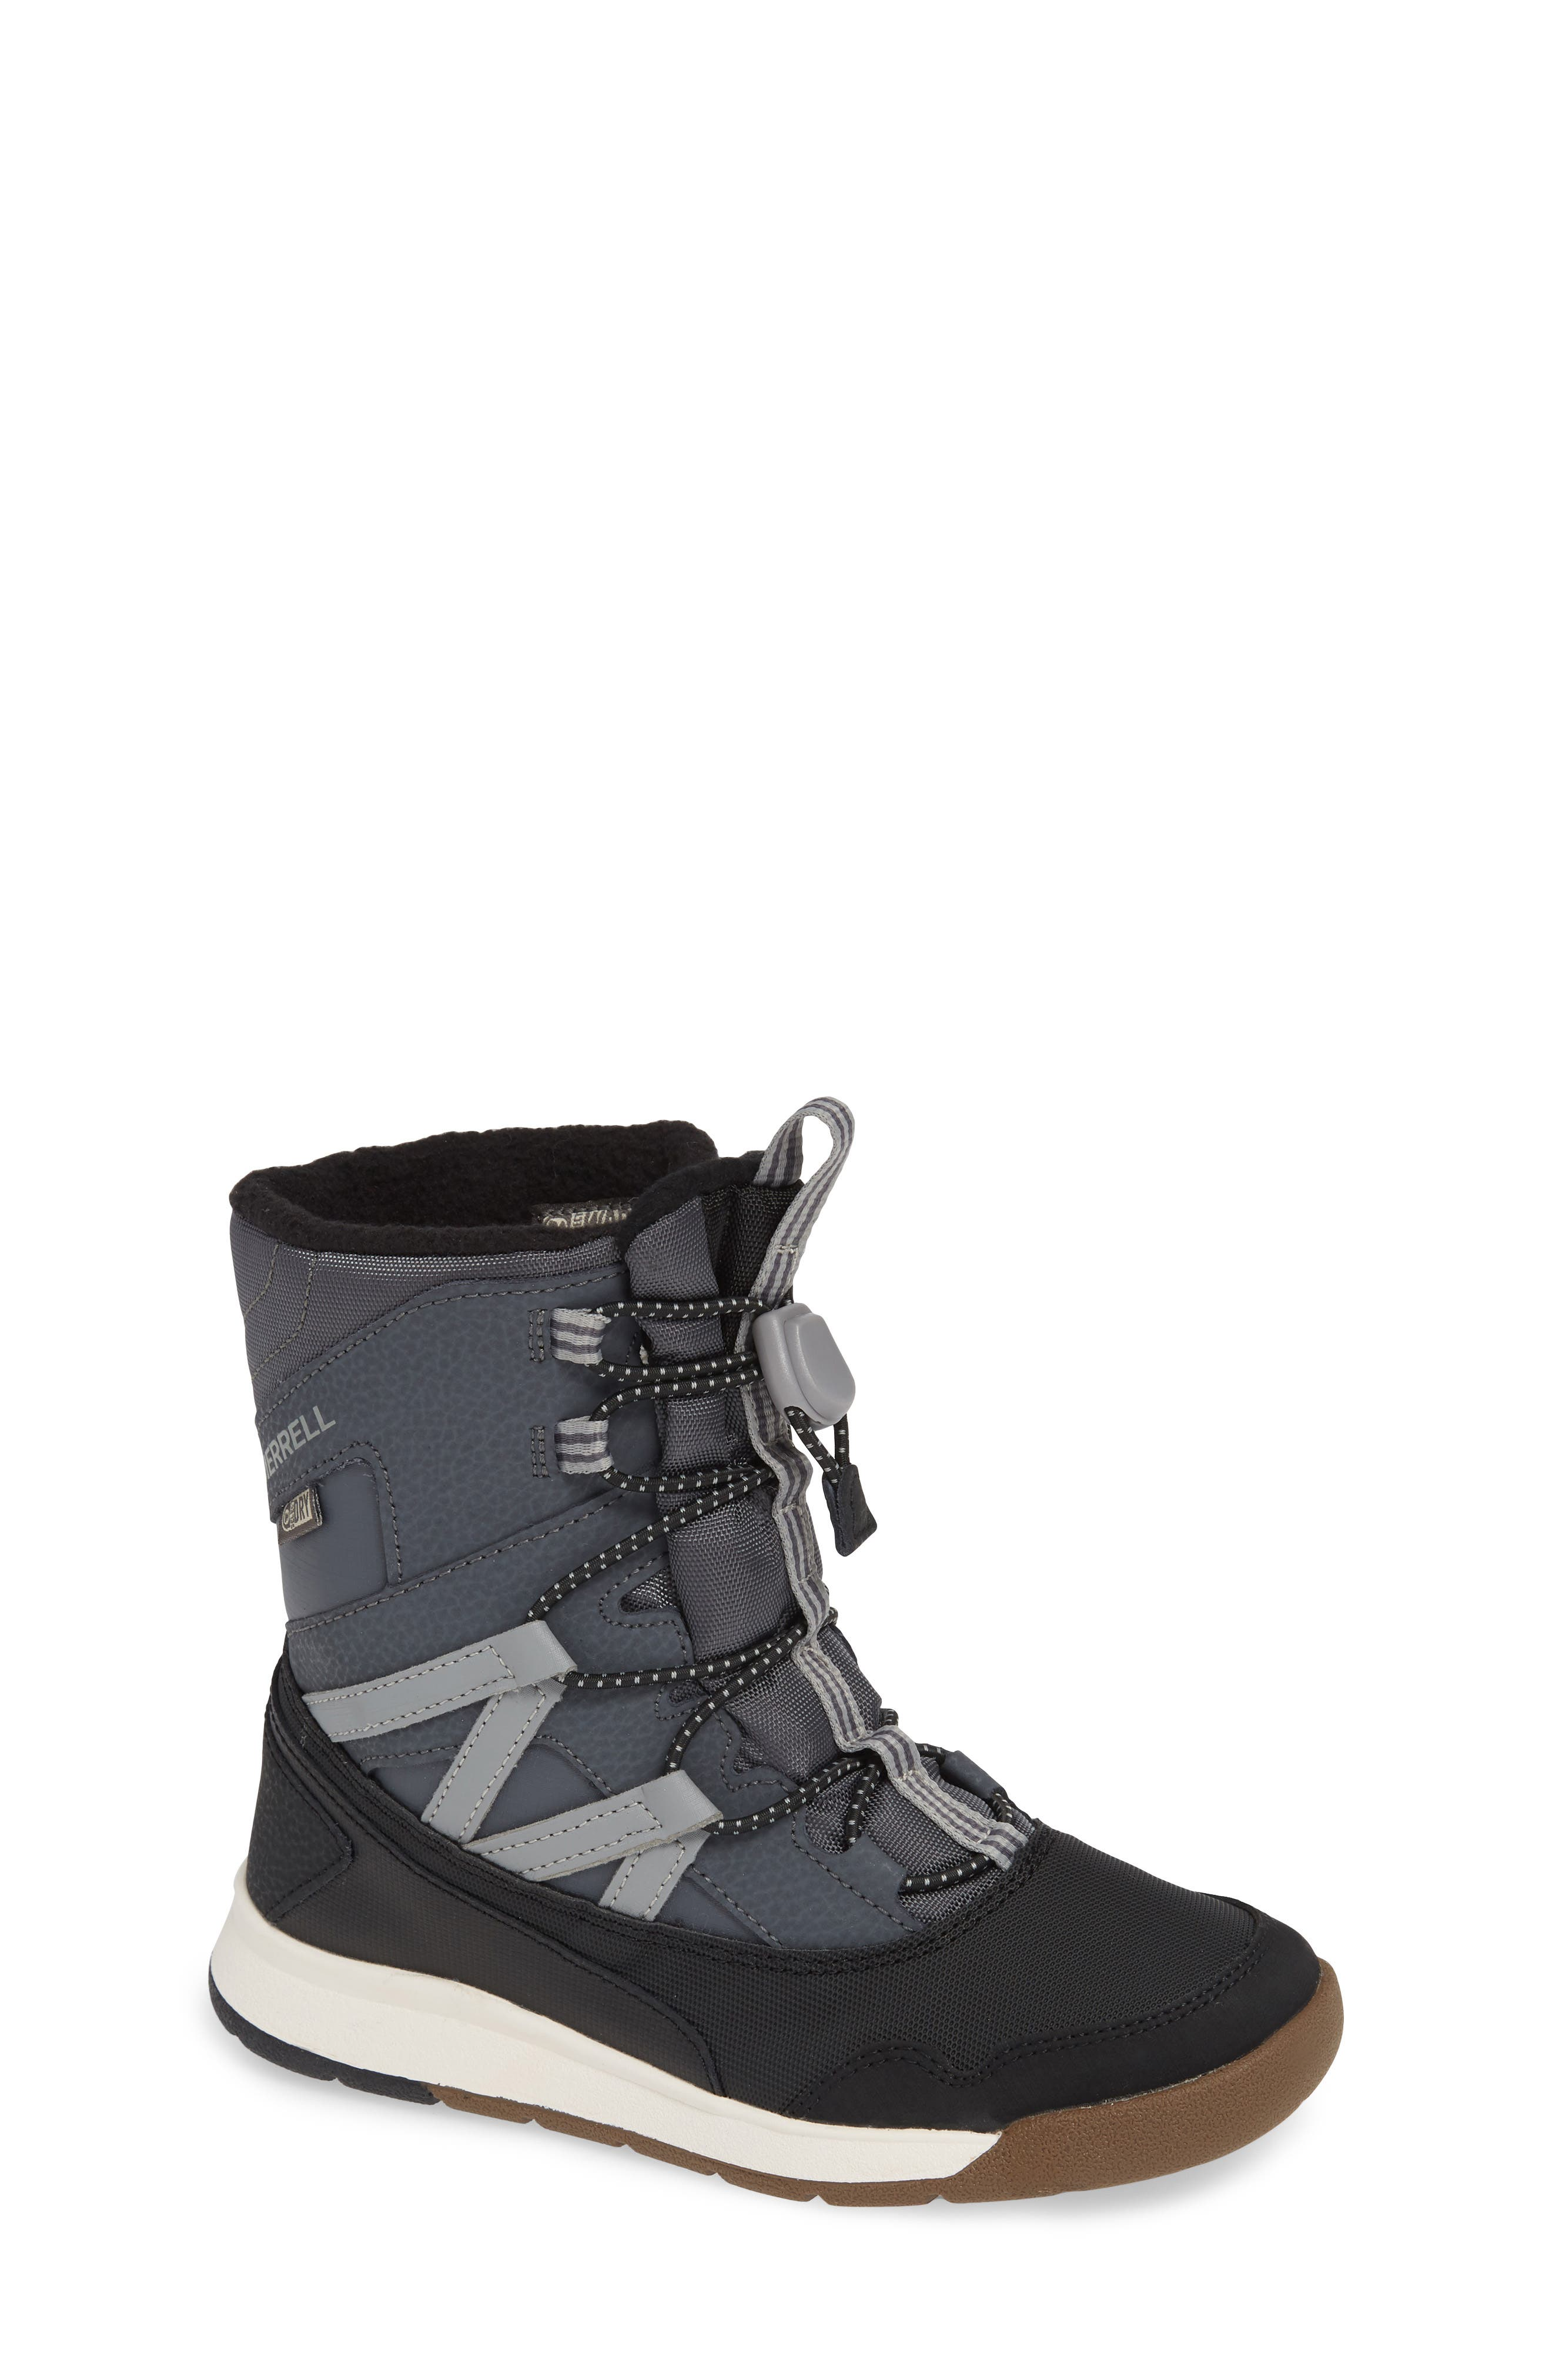 Snow Crush Waterproof Snow Boot,                         Main,                         color, 020